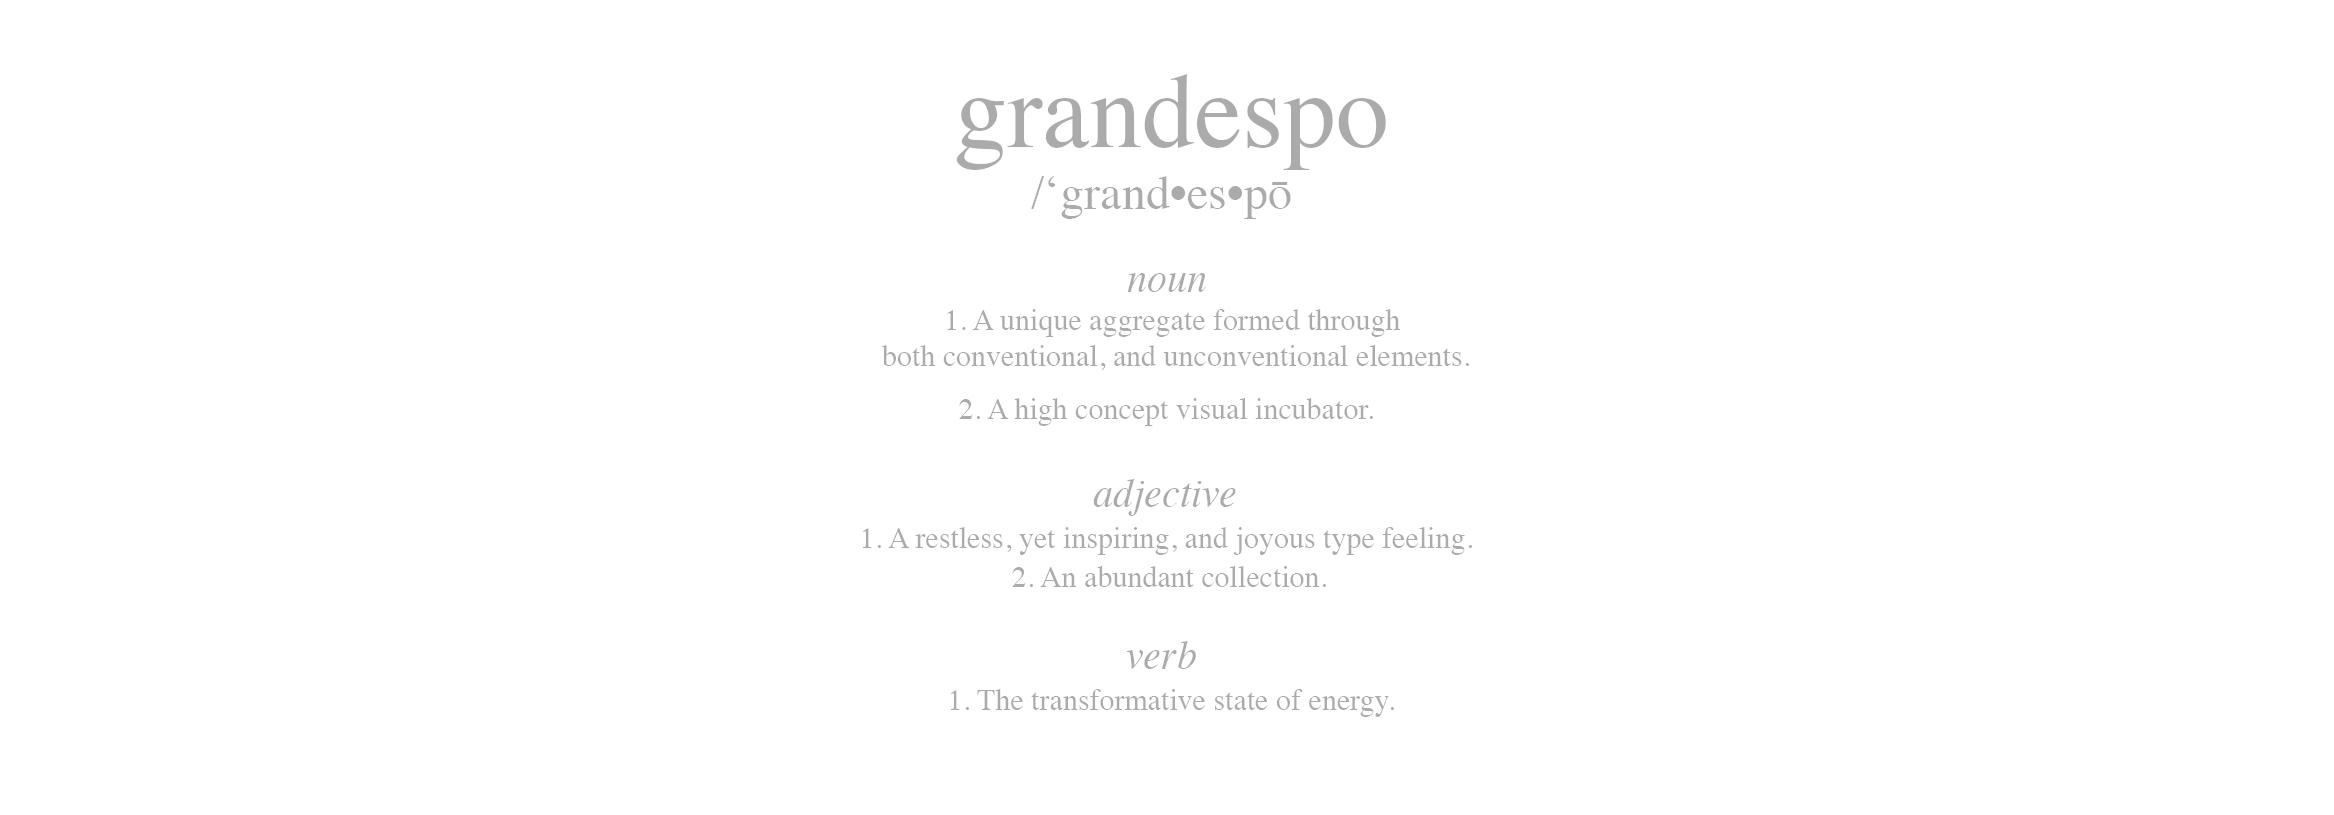 GrandespoDef.png